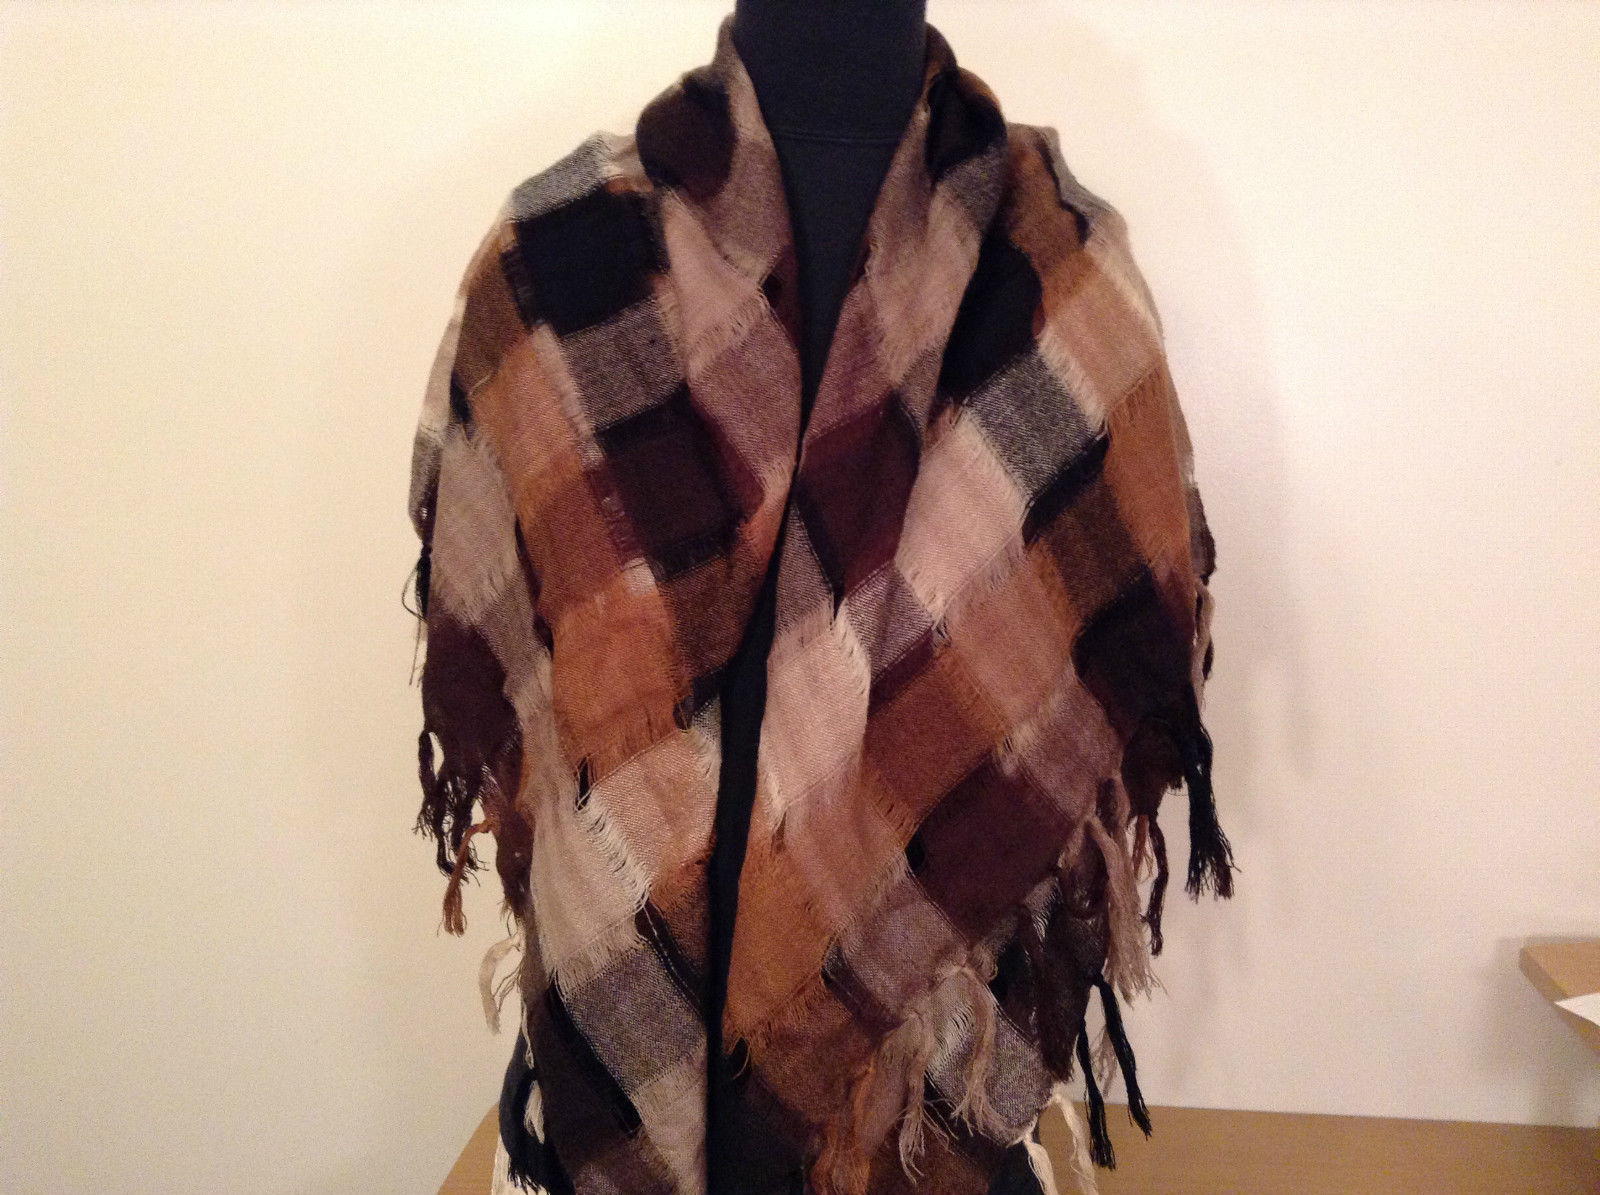 Black Brown Beige Tan Plaid Fashionable Scarf Wrap Shawl Length 42 Inches